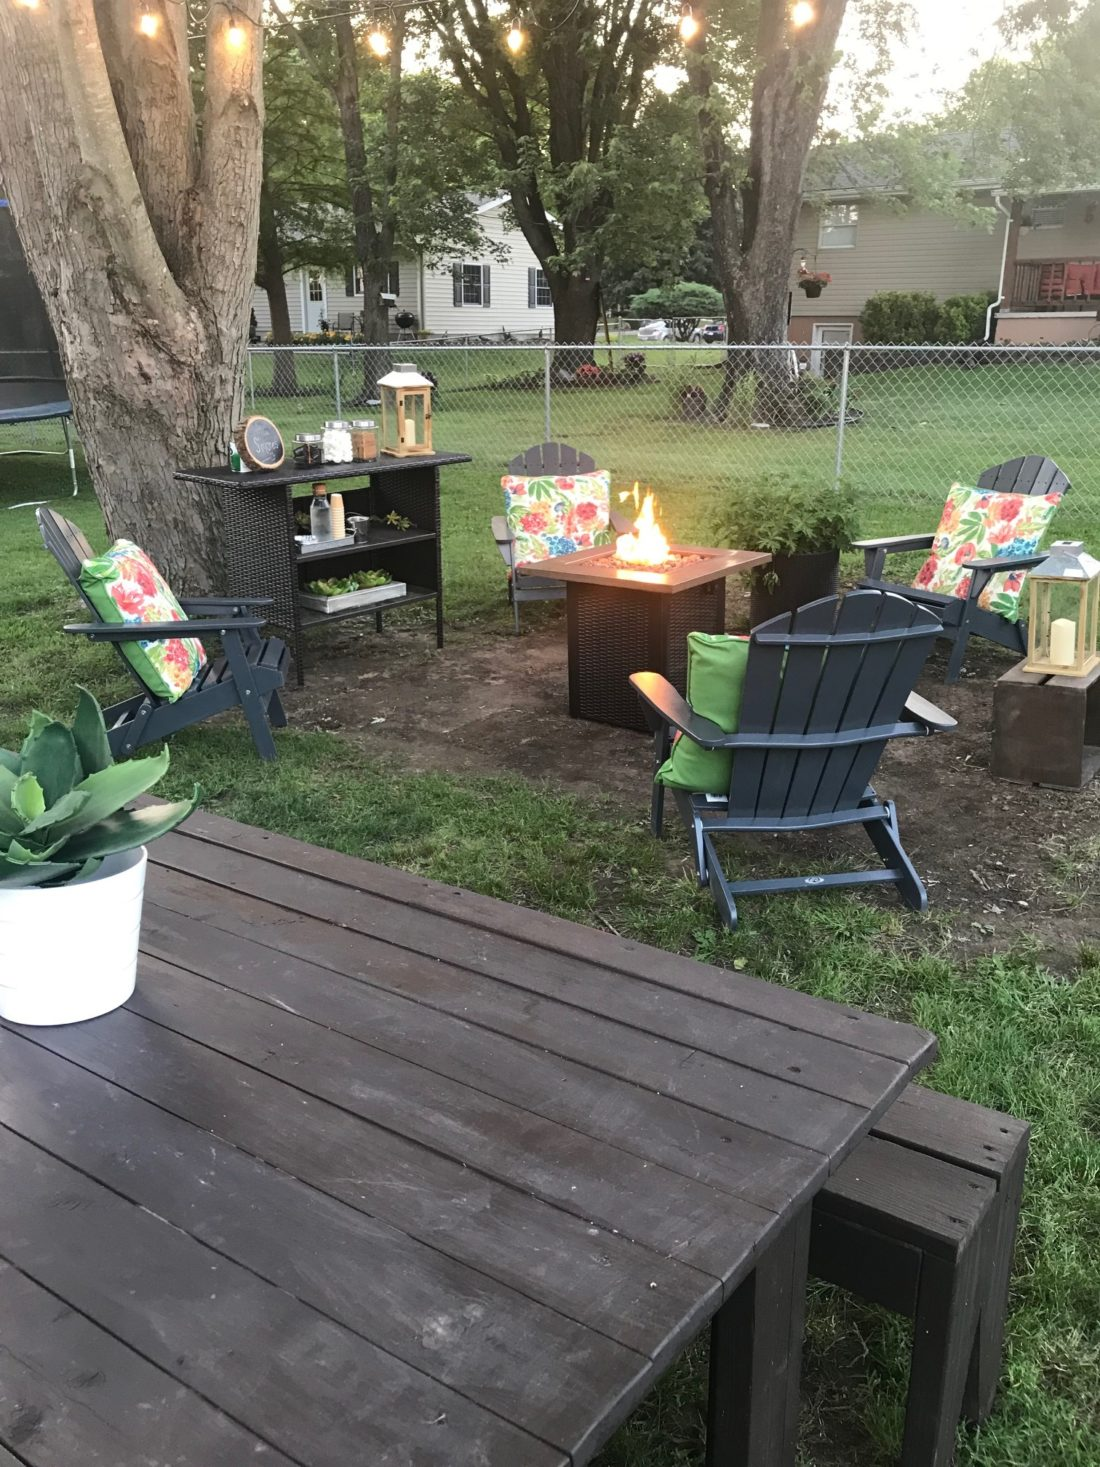 How to hang outdoor string lights   Backyard DIY Ideas - A ... on Backyard String Lights Diy id=59410